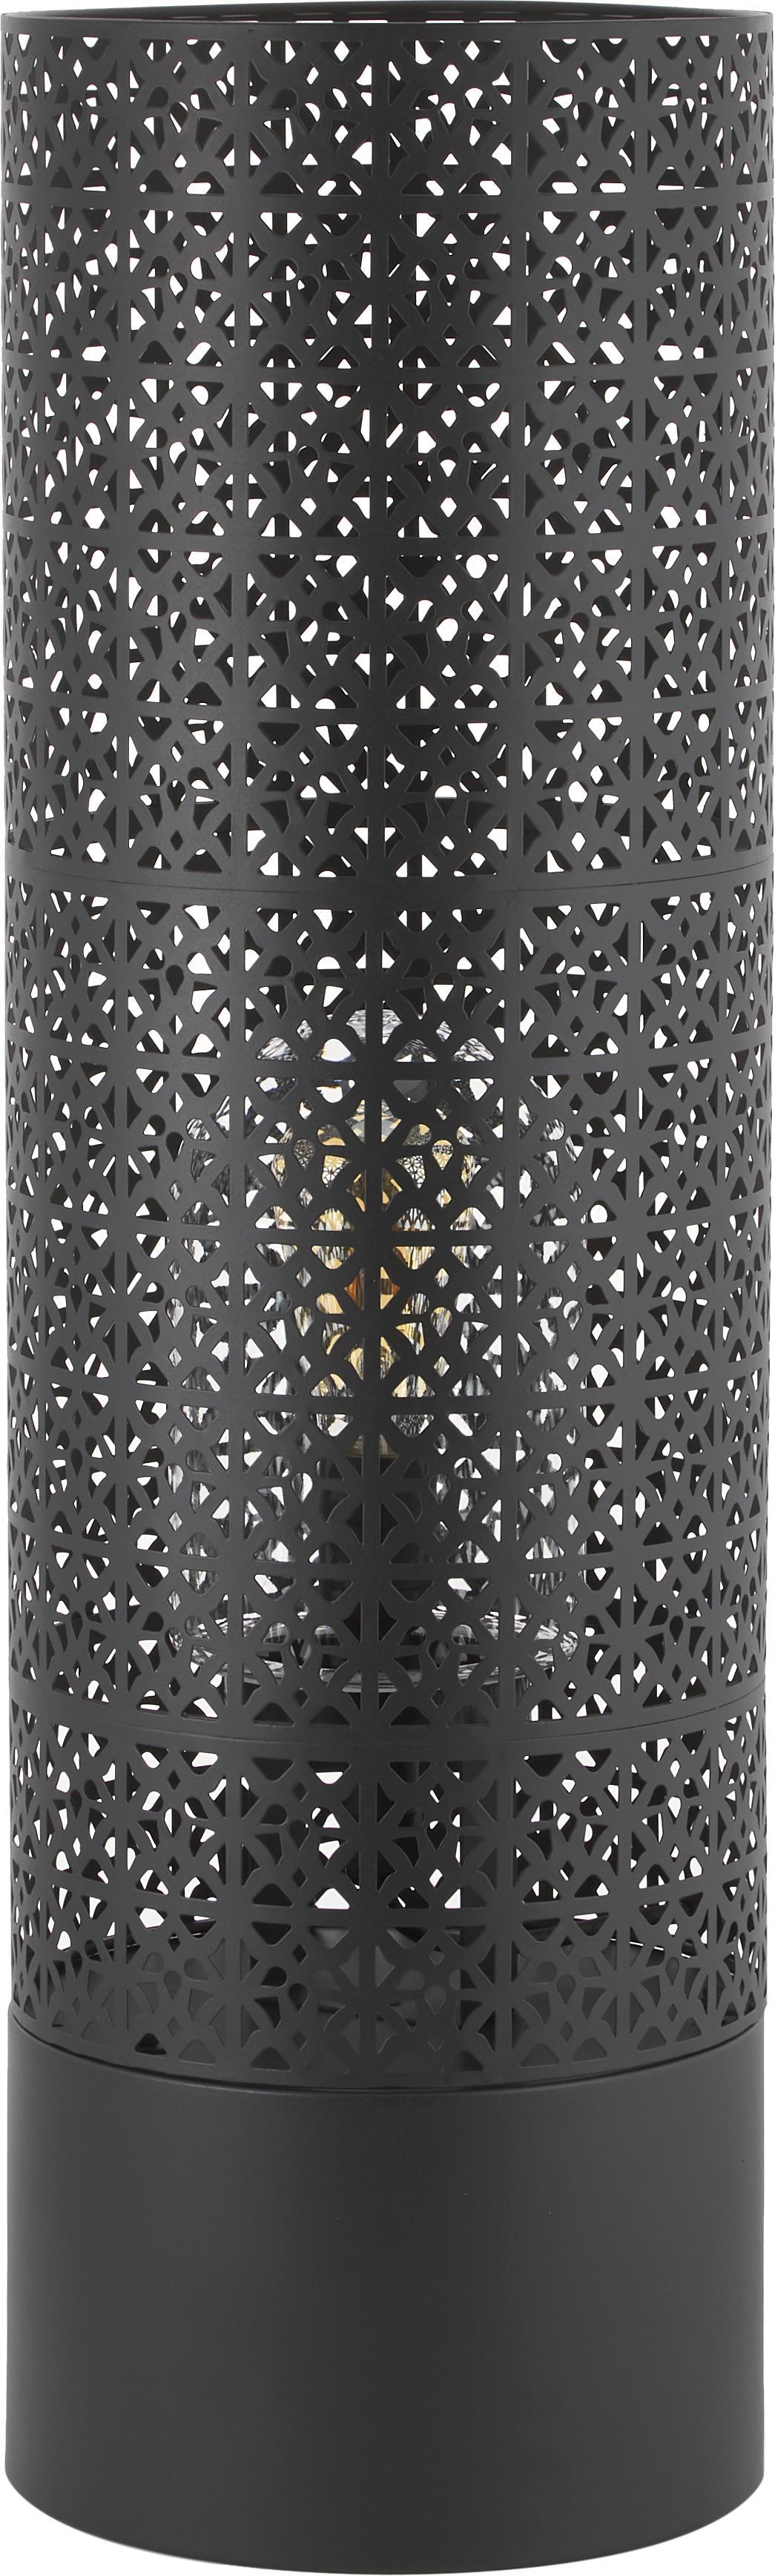 Lampada da terra da esterno boho Maison, Lampada: metallo verniciato a polv, Nero, Ø 24 x Alt. 78 cm